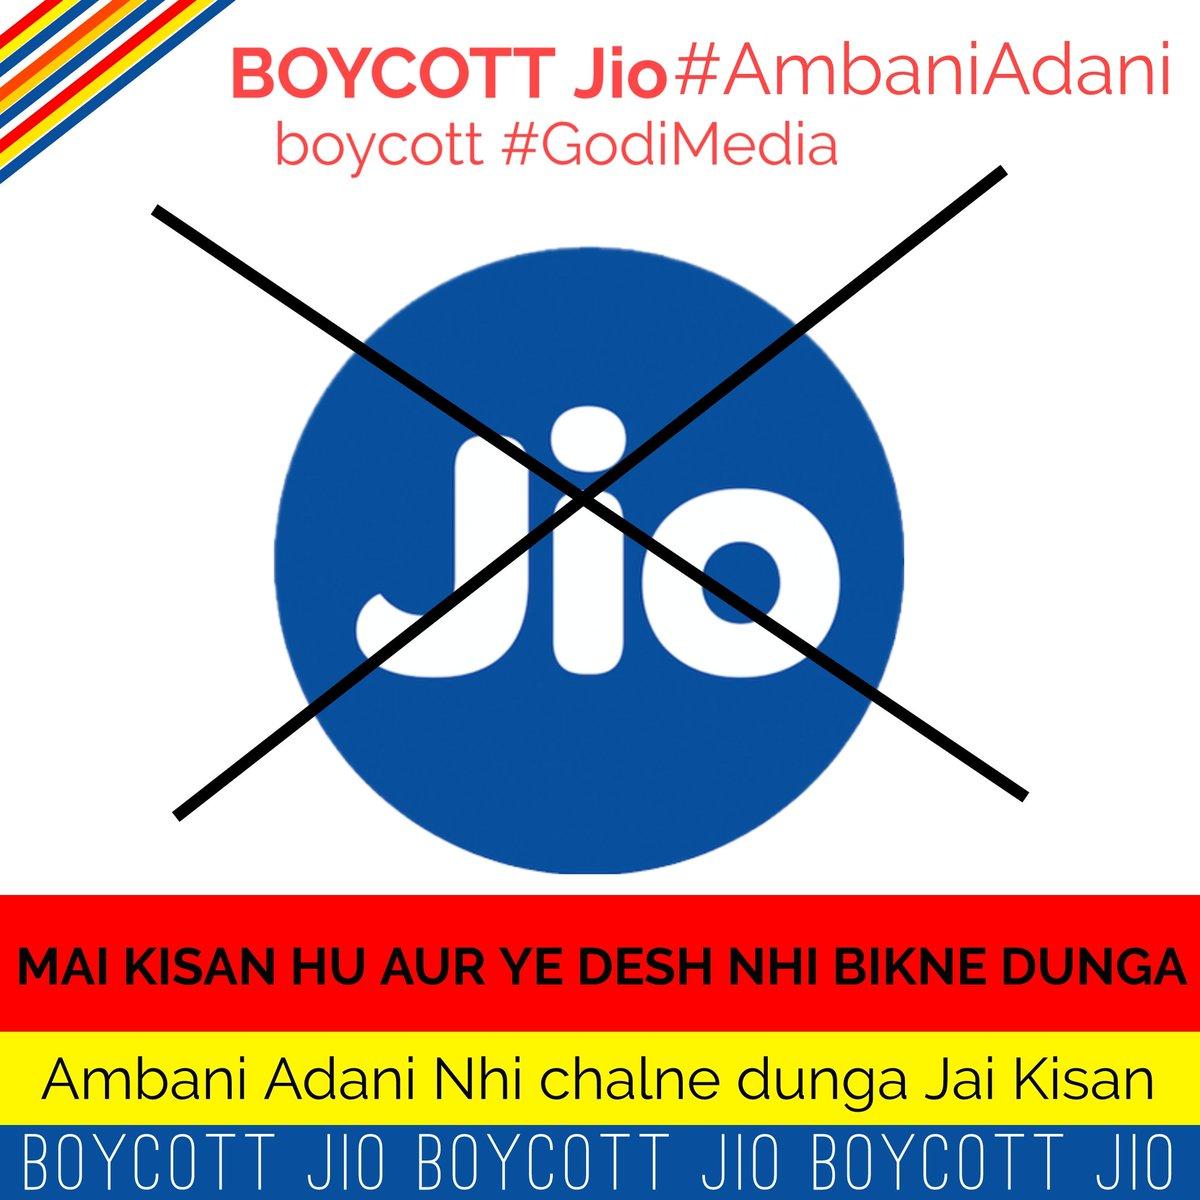 #boycottjio_savefarmers  #boycottgodimedia #BoycottAdaniAmbani  #kisanektazindabad  #KisanNahiToDeshNahi